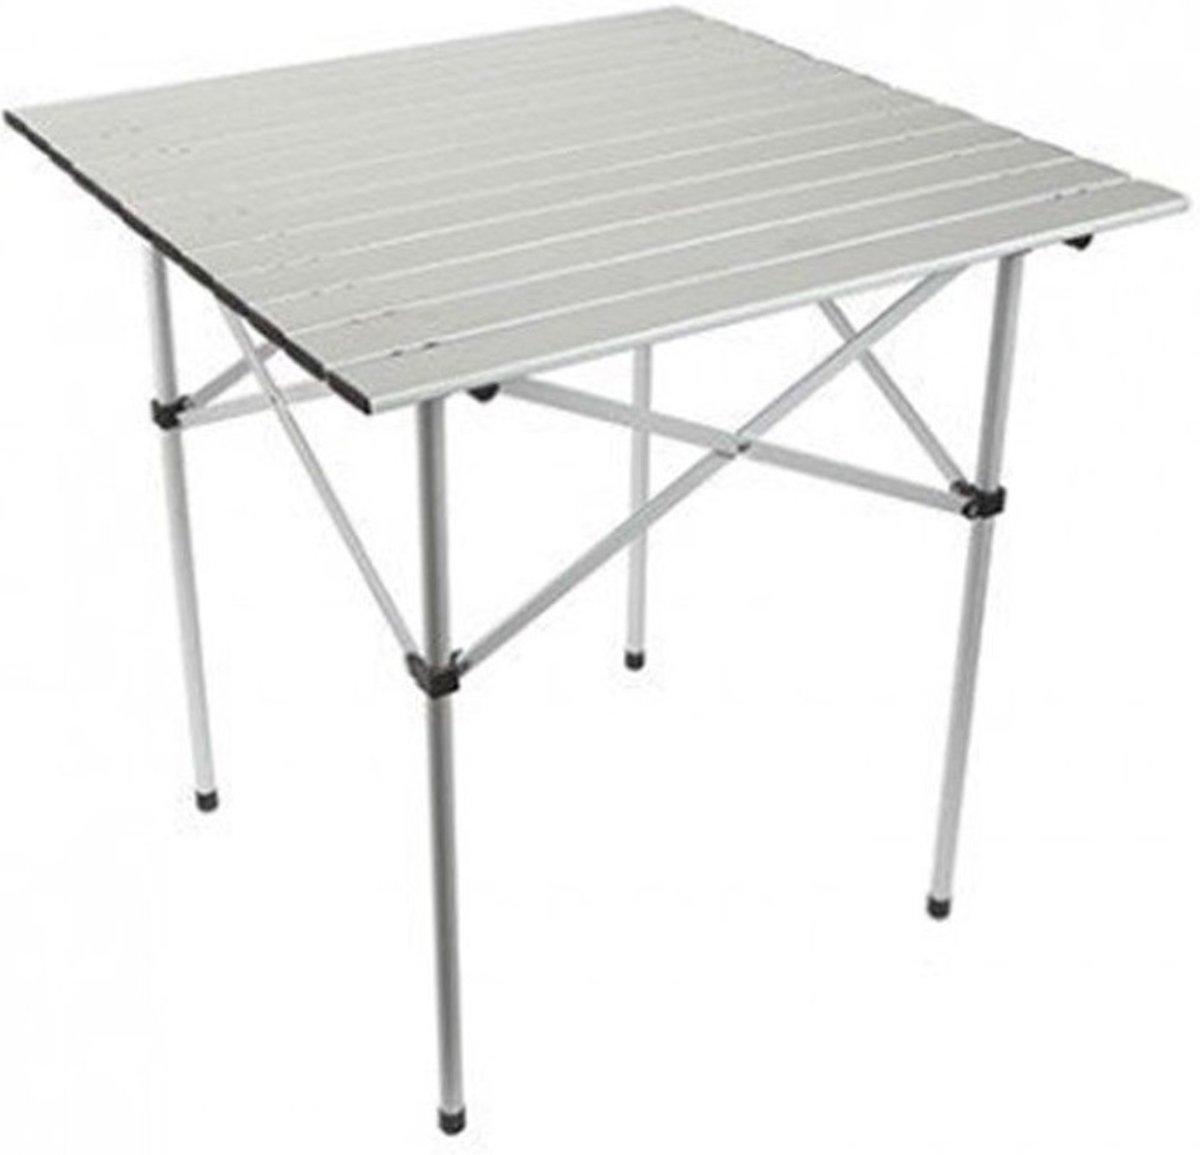 Summit Campingtafel Roll Top Aluminium 70 X 70 X 70 Cm Wit kopen